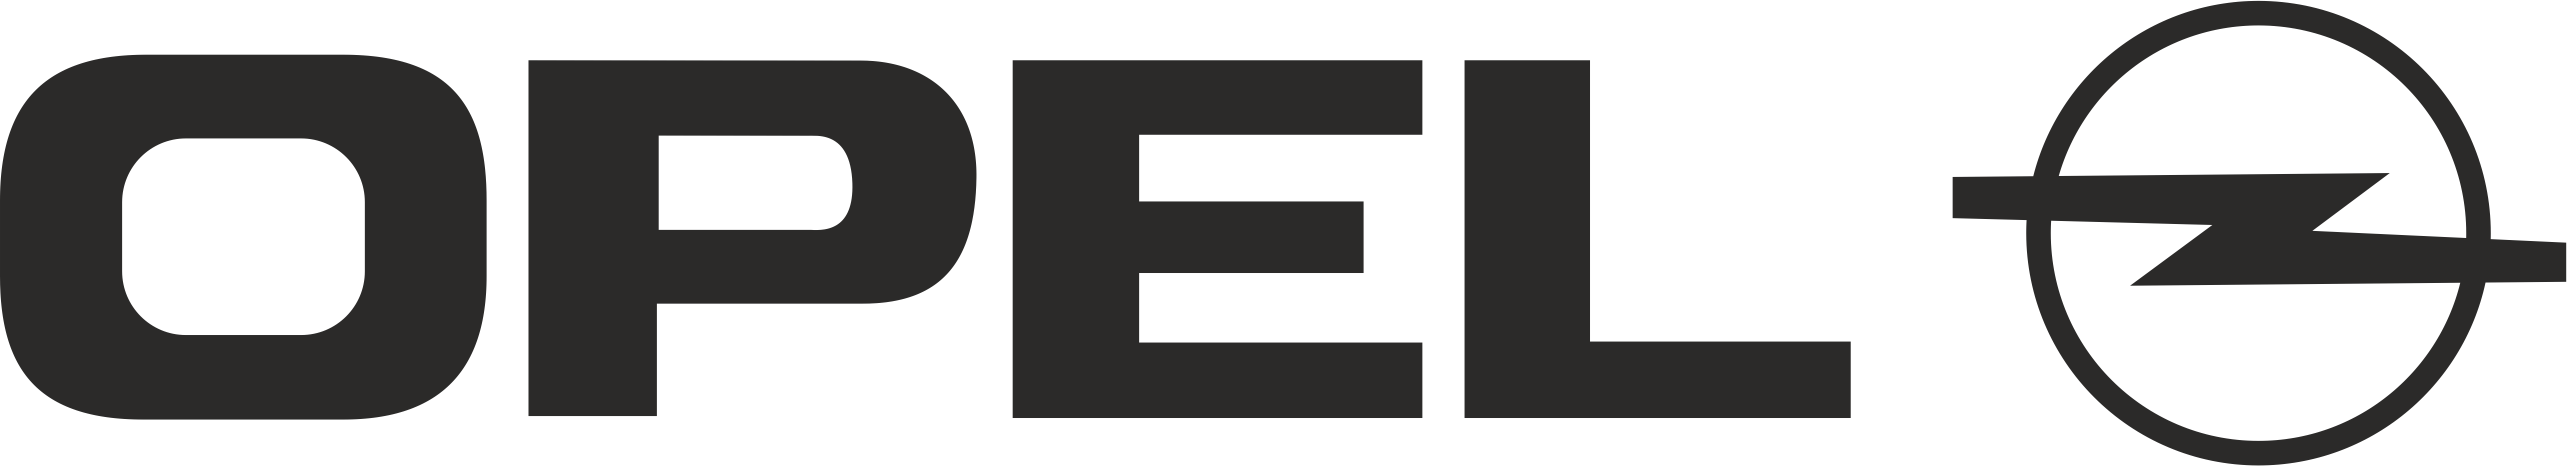 opel logo vector free vector cdr download 3axisco